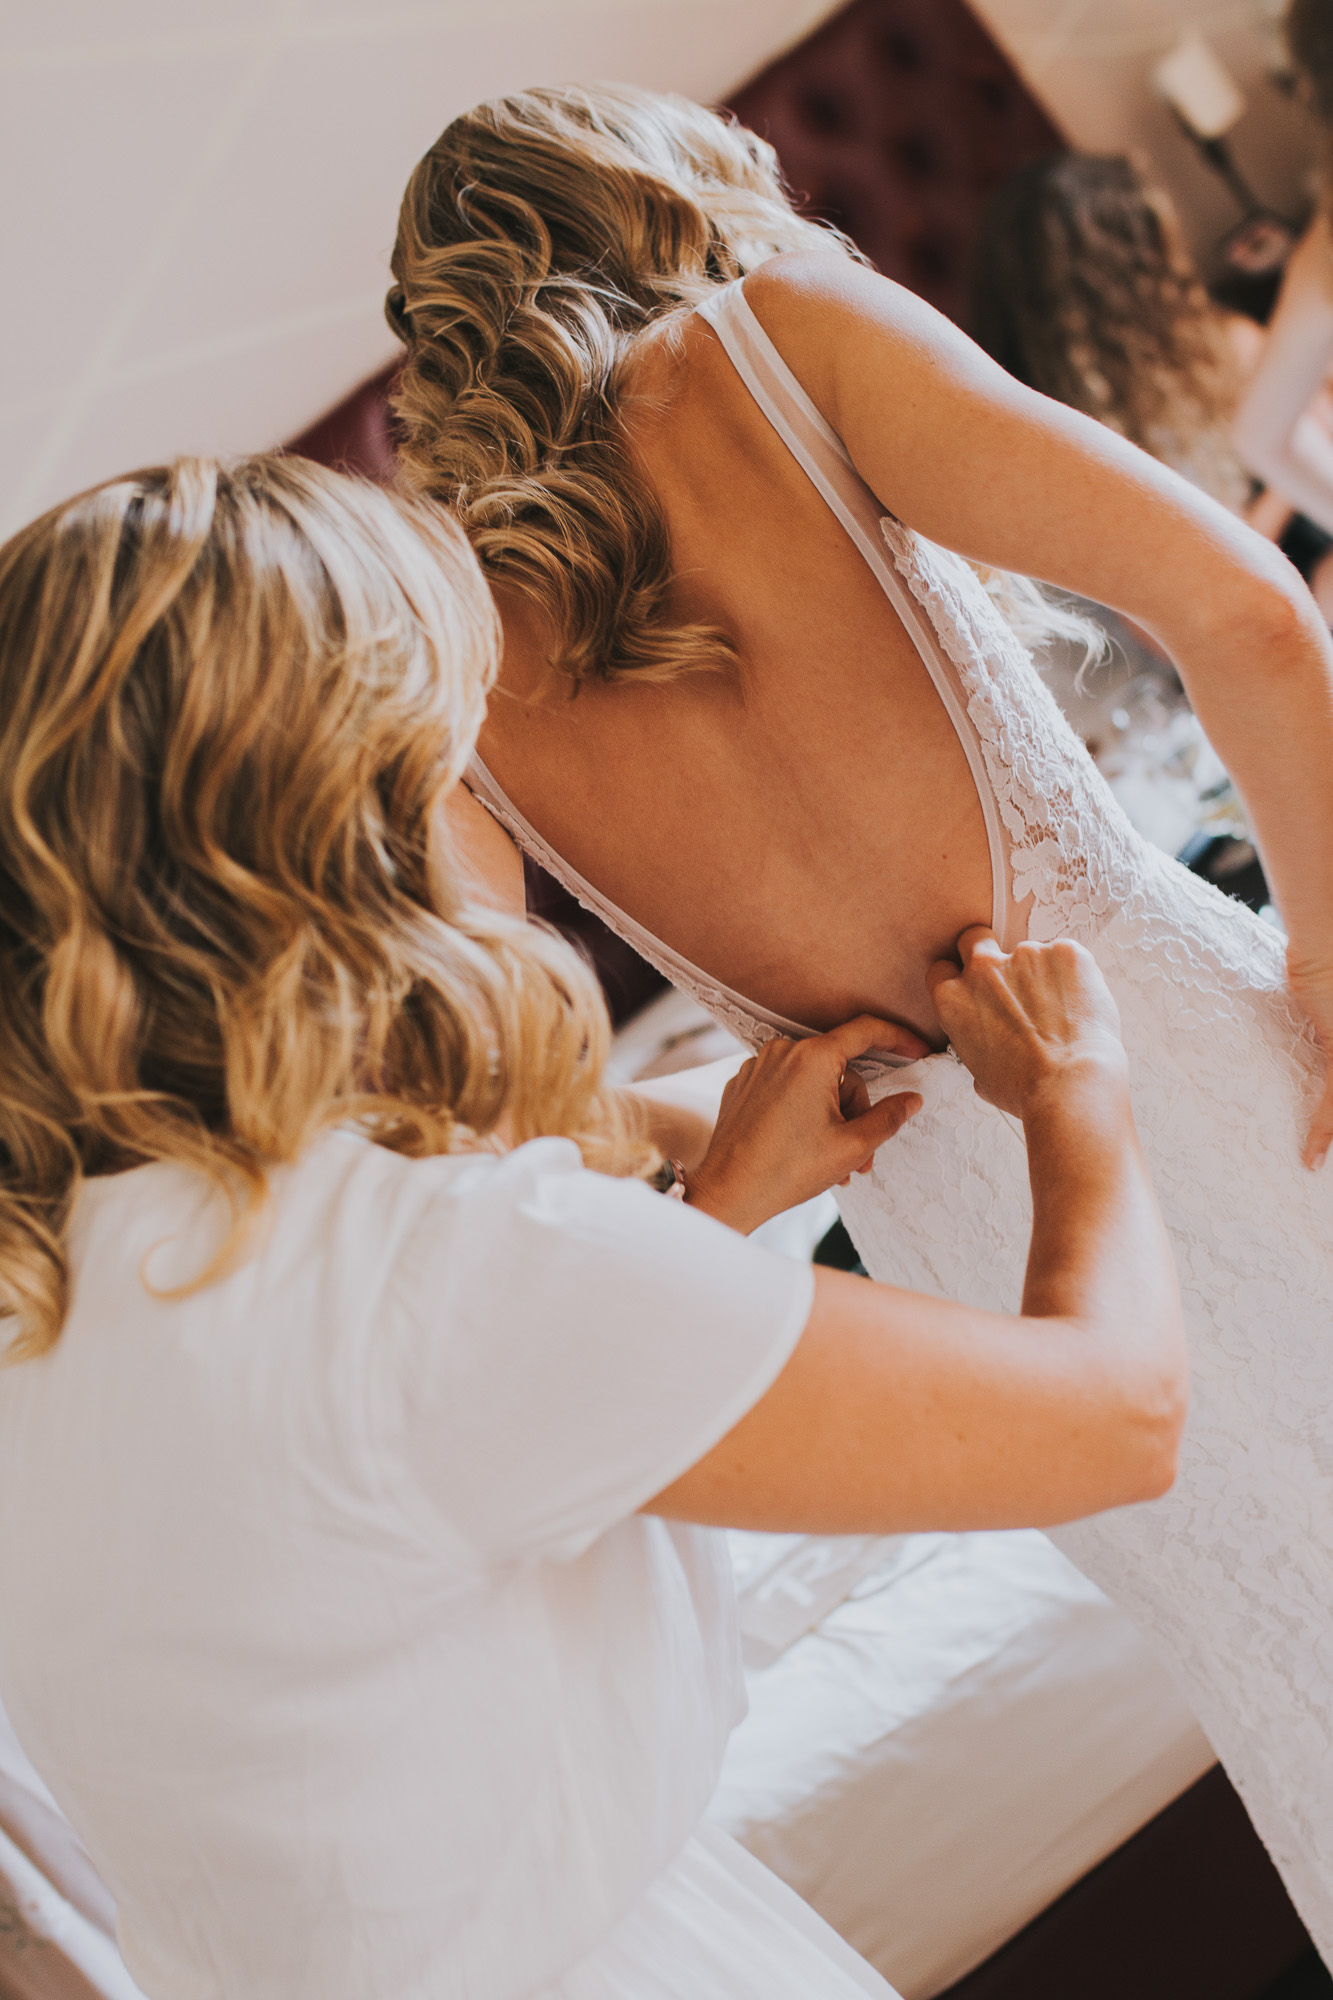 20180720-Memoryfactory-Sara&Jacopo-9- Hochzeit.jpg